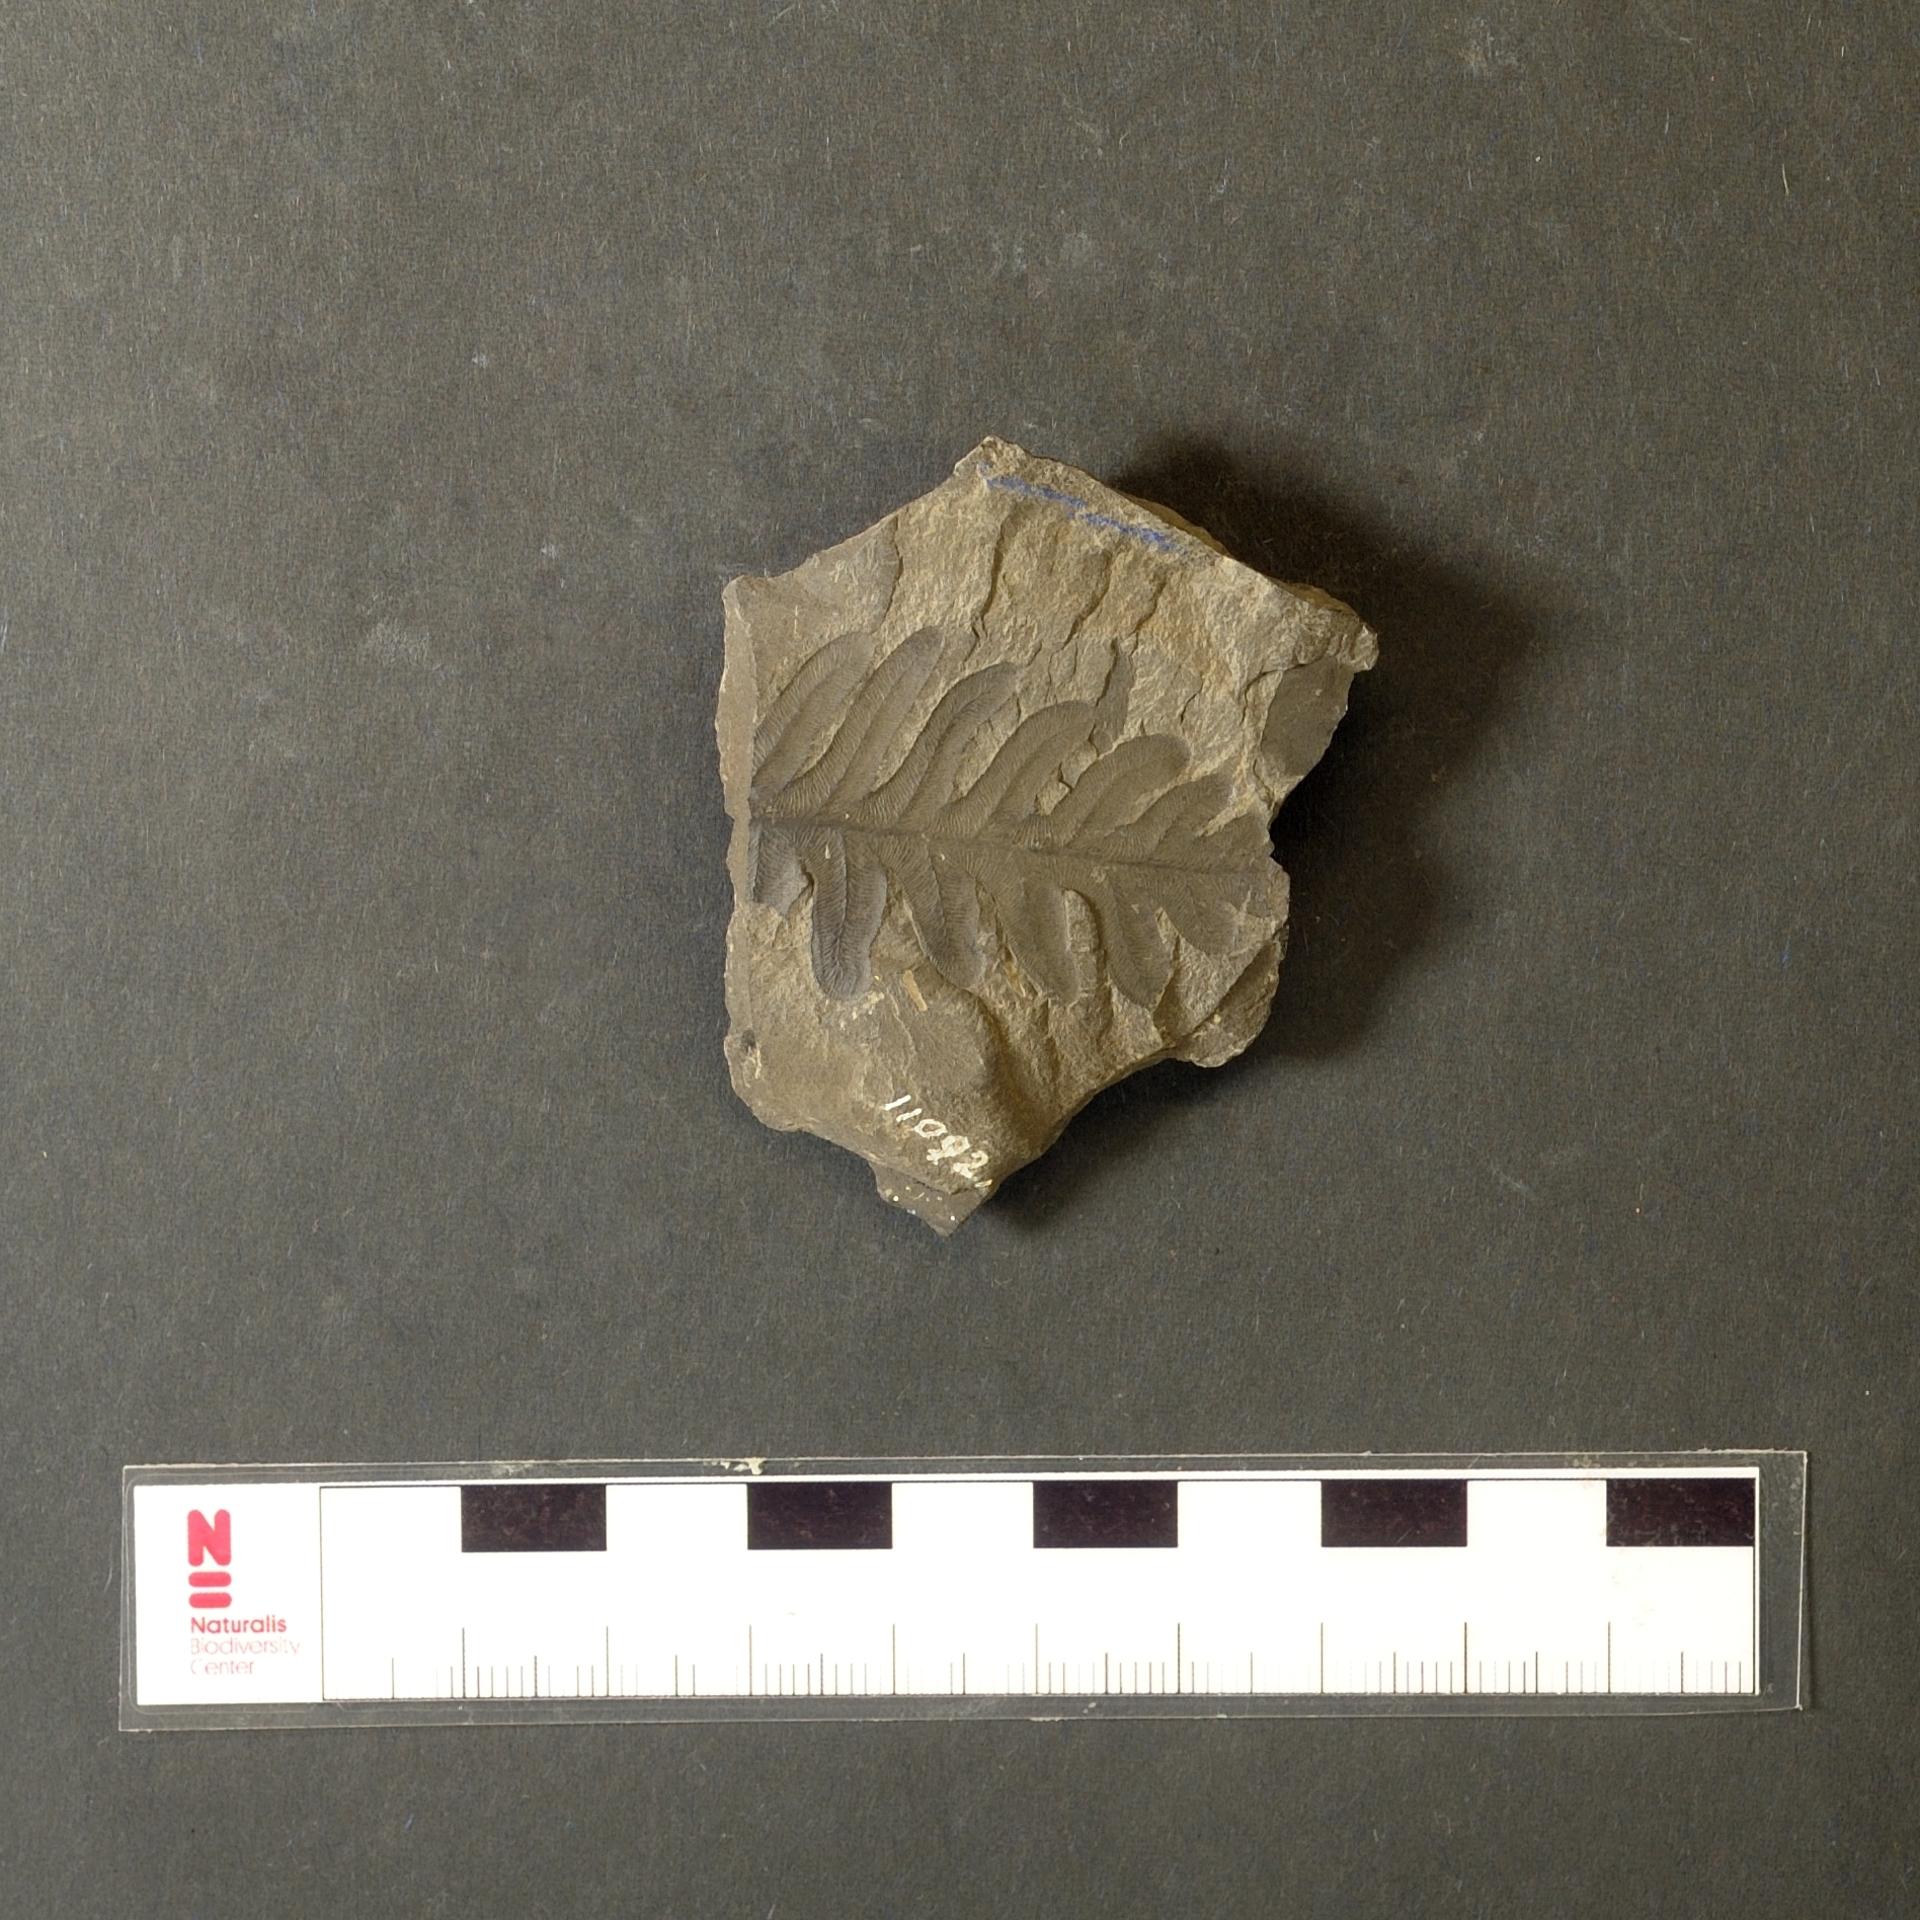 RGM.JMS.45197 | Alethopteris barruelensis